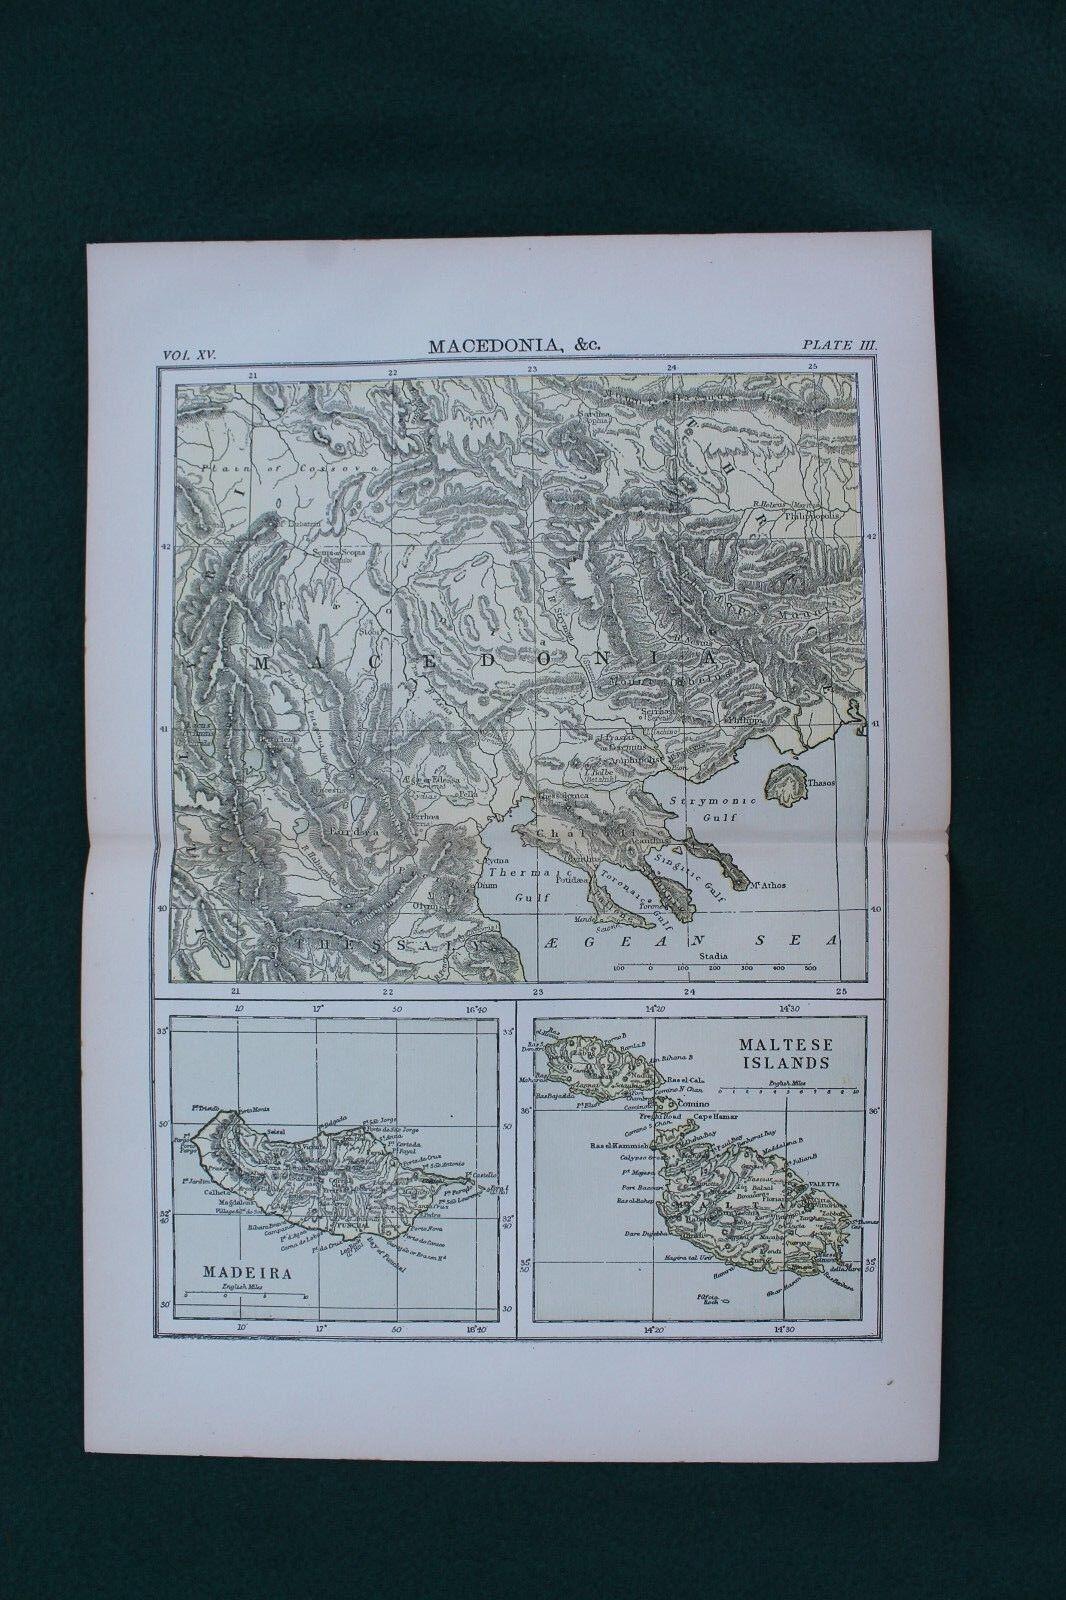 1890S MAP  MACEDONIA MADEIRA MALTESE ISLANDS  10 X 14 INCH